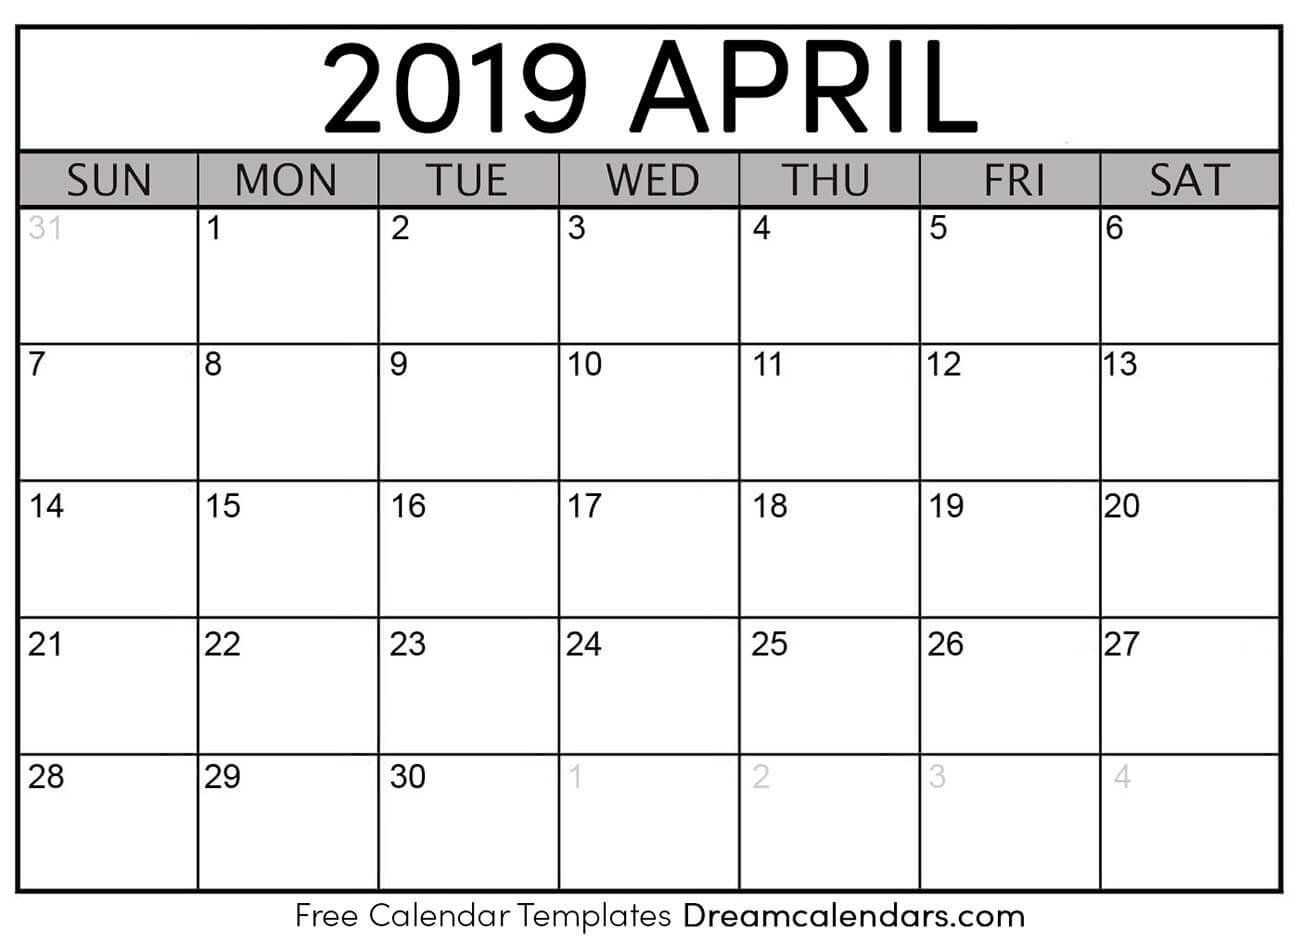 Calendar April 2019 Printable